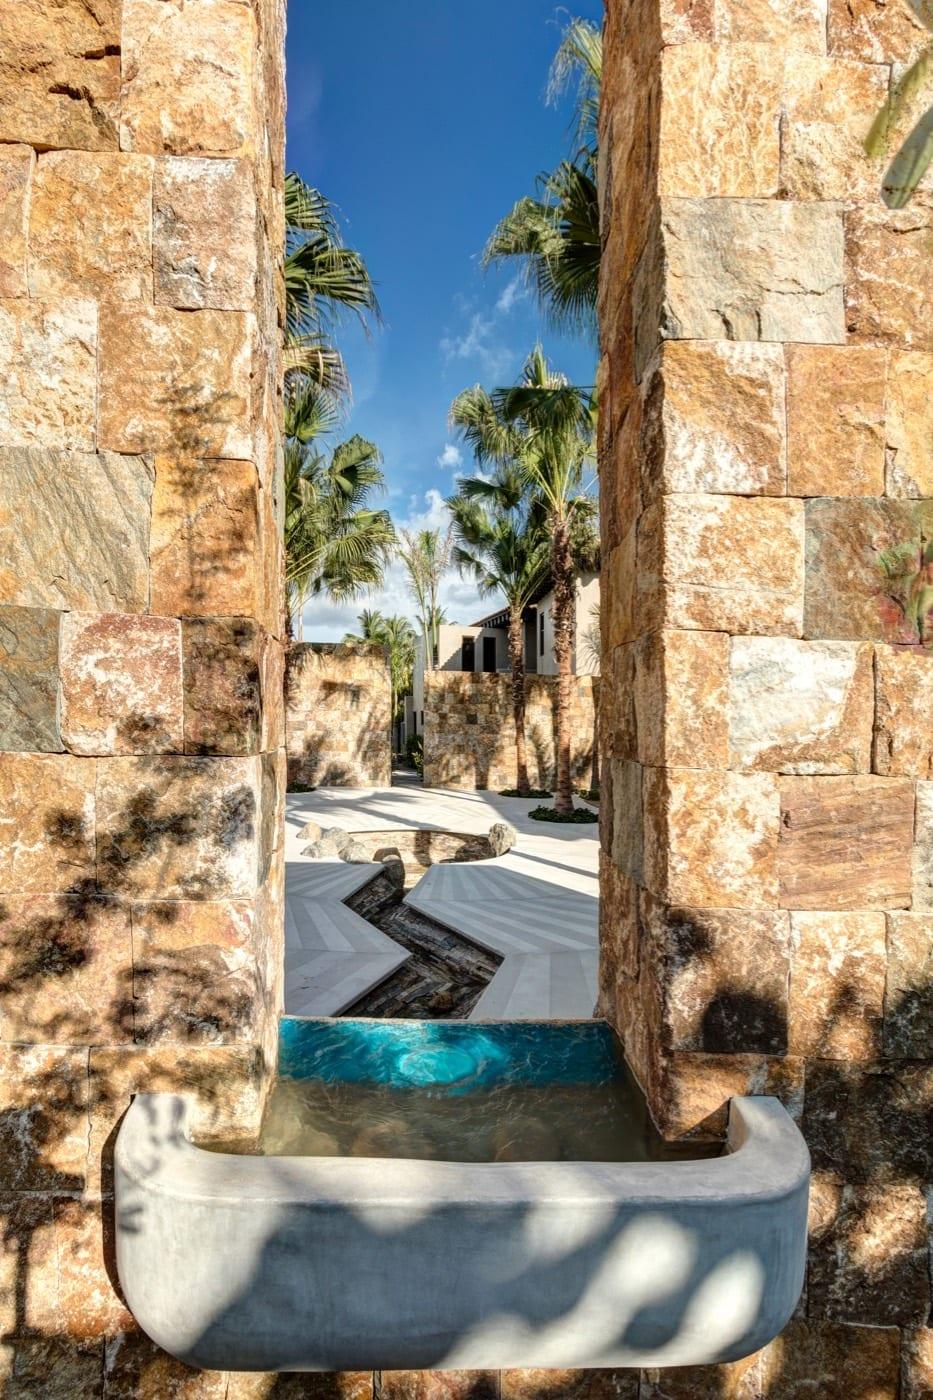 Casa Koko Detail Entrance Fountain From Behind